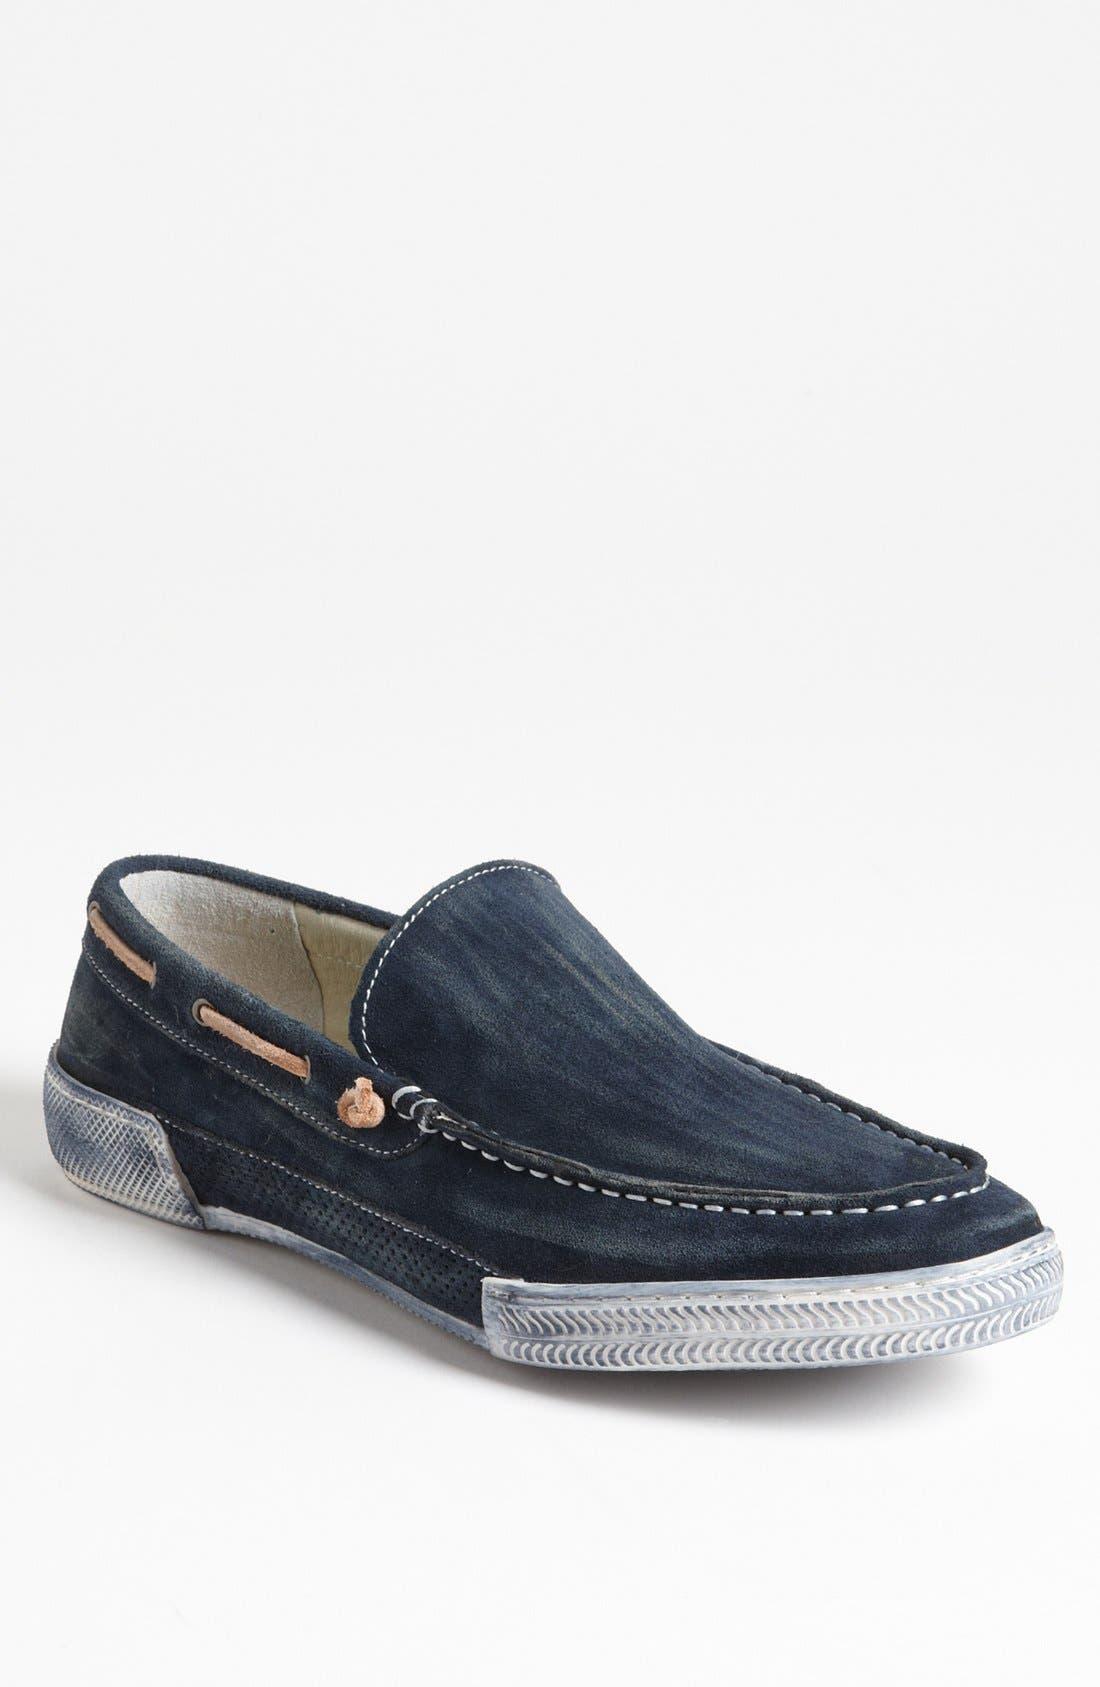 Alternate Image 1 Selected - Rogue 'Rascal' Boat Shoe